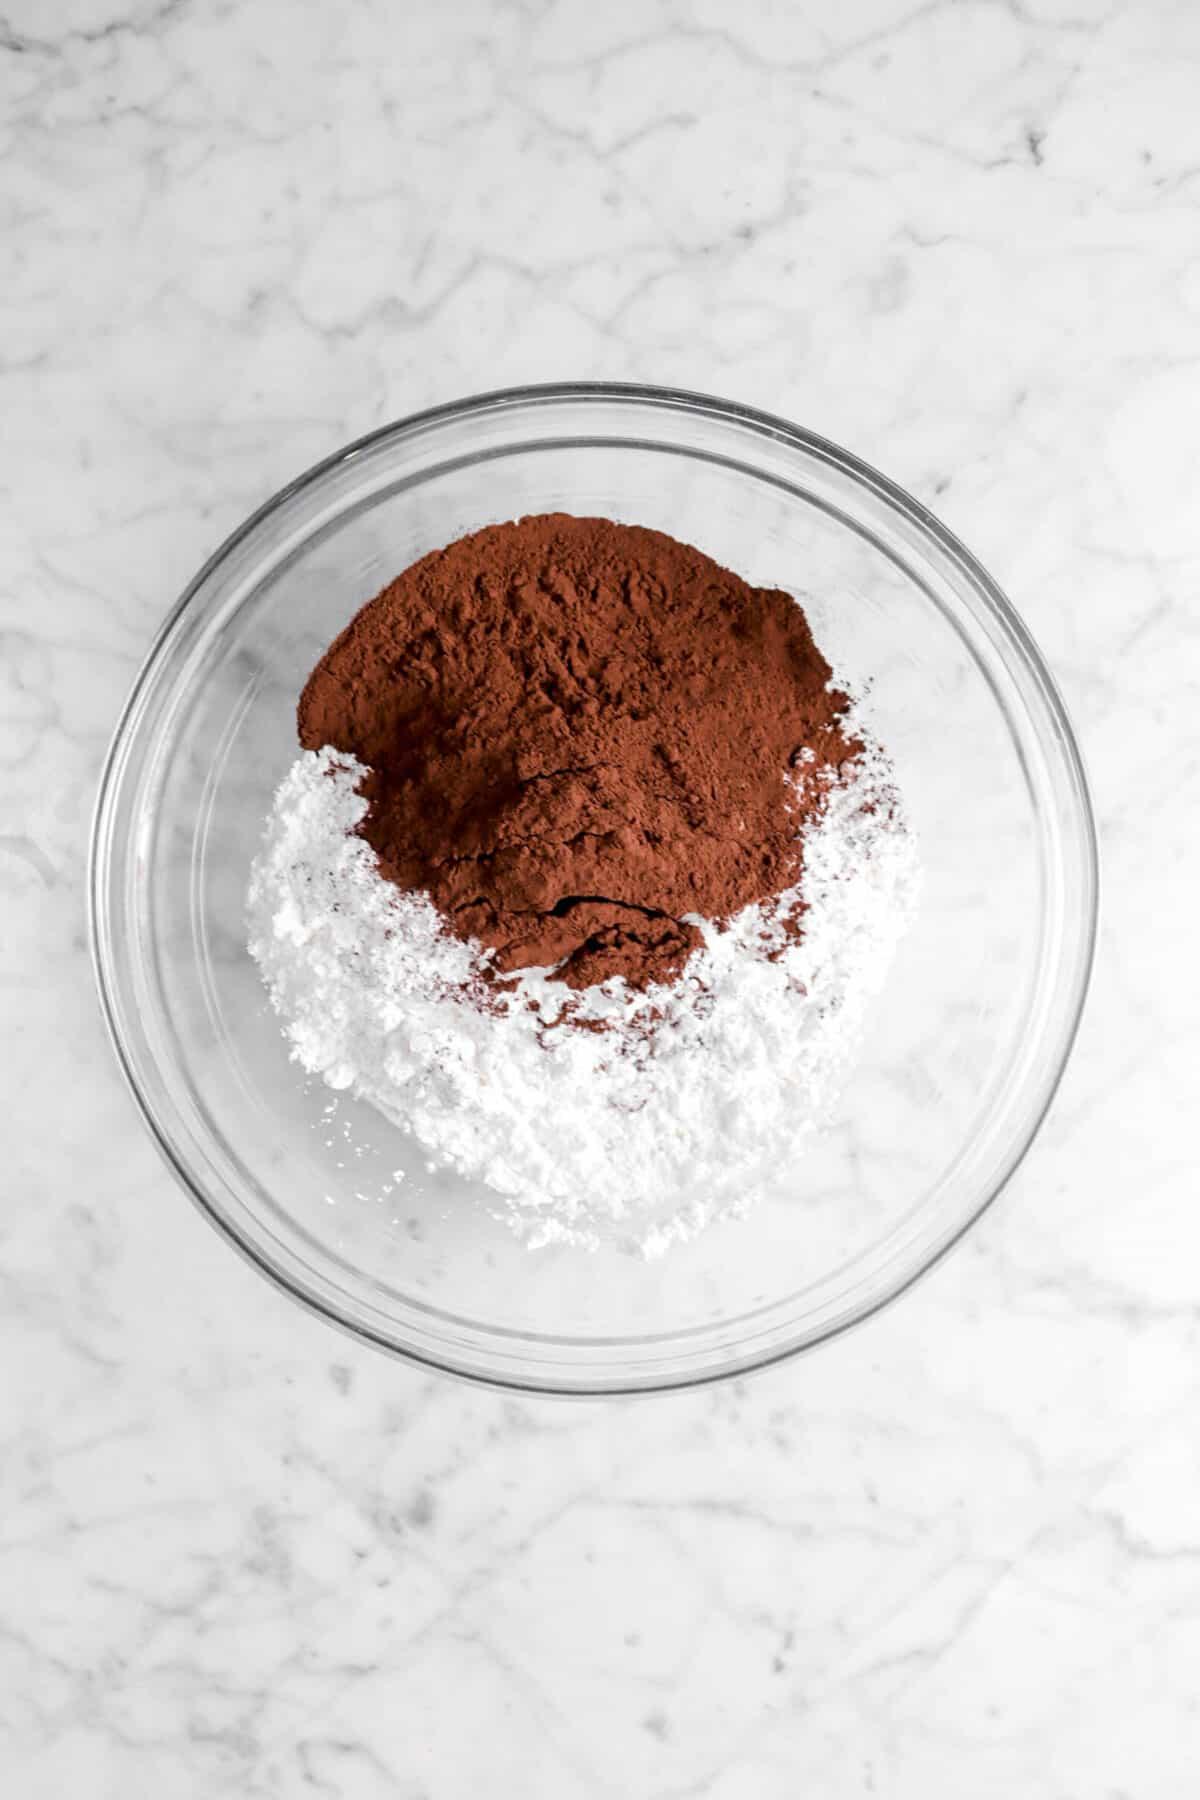 cocoa powder, powdered sugar, and milk in a glass bowl